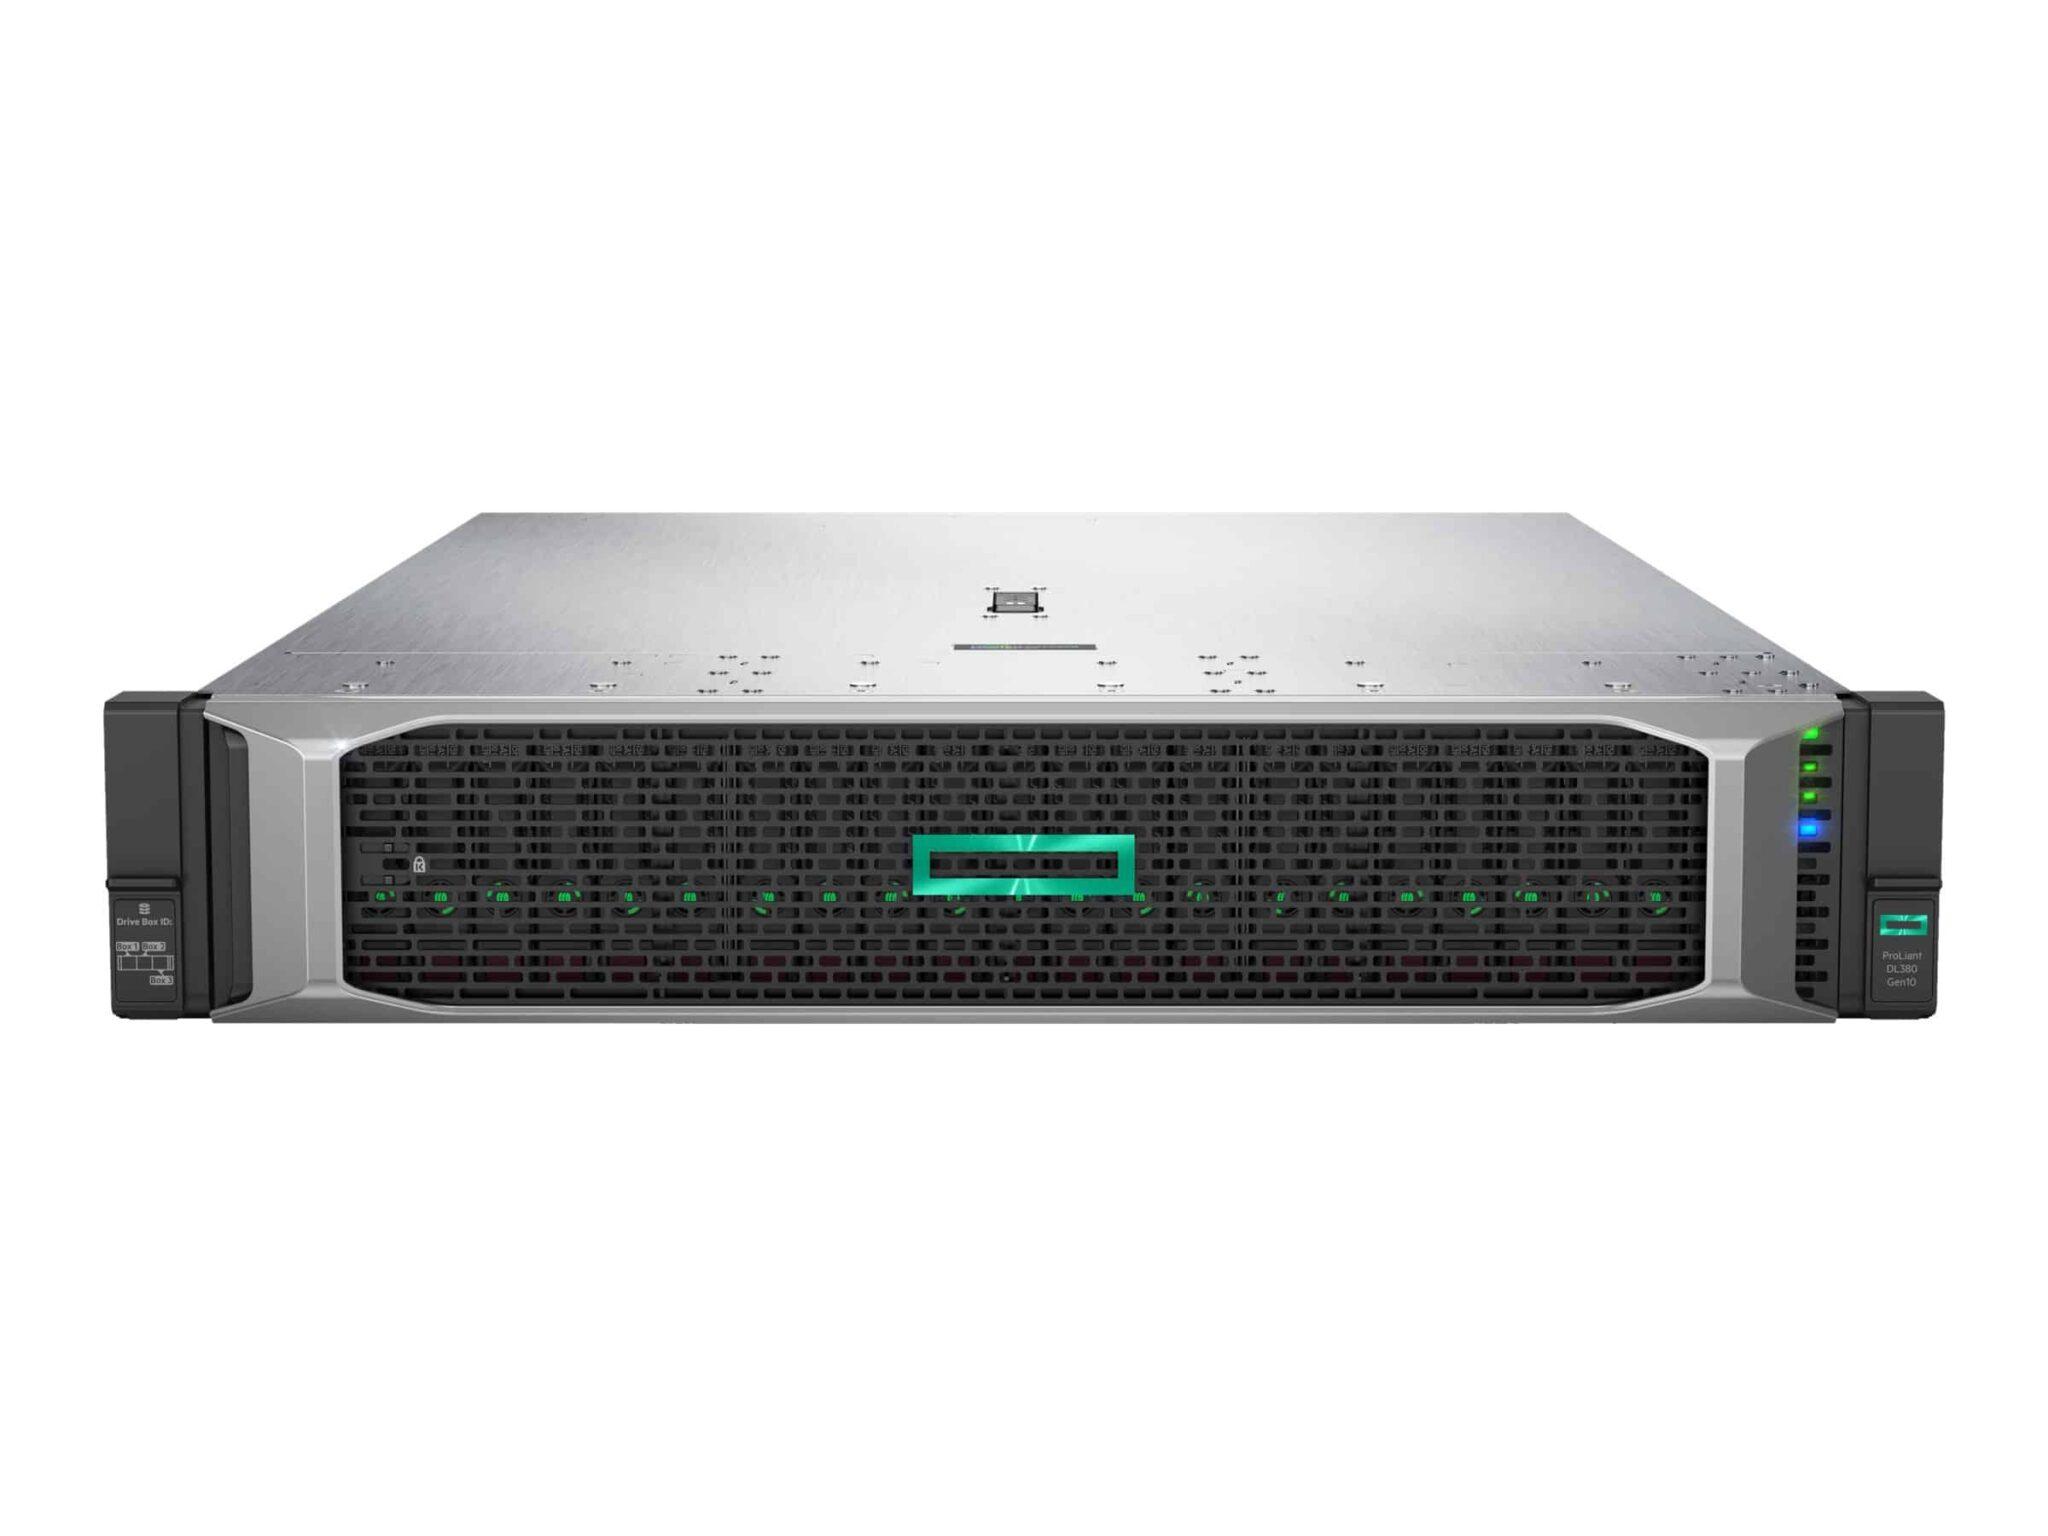 Hpe-proliant-dl380-rack-mountable-2u-server-1p-xeon-silver-4110-ram-16-gb